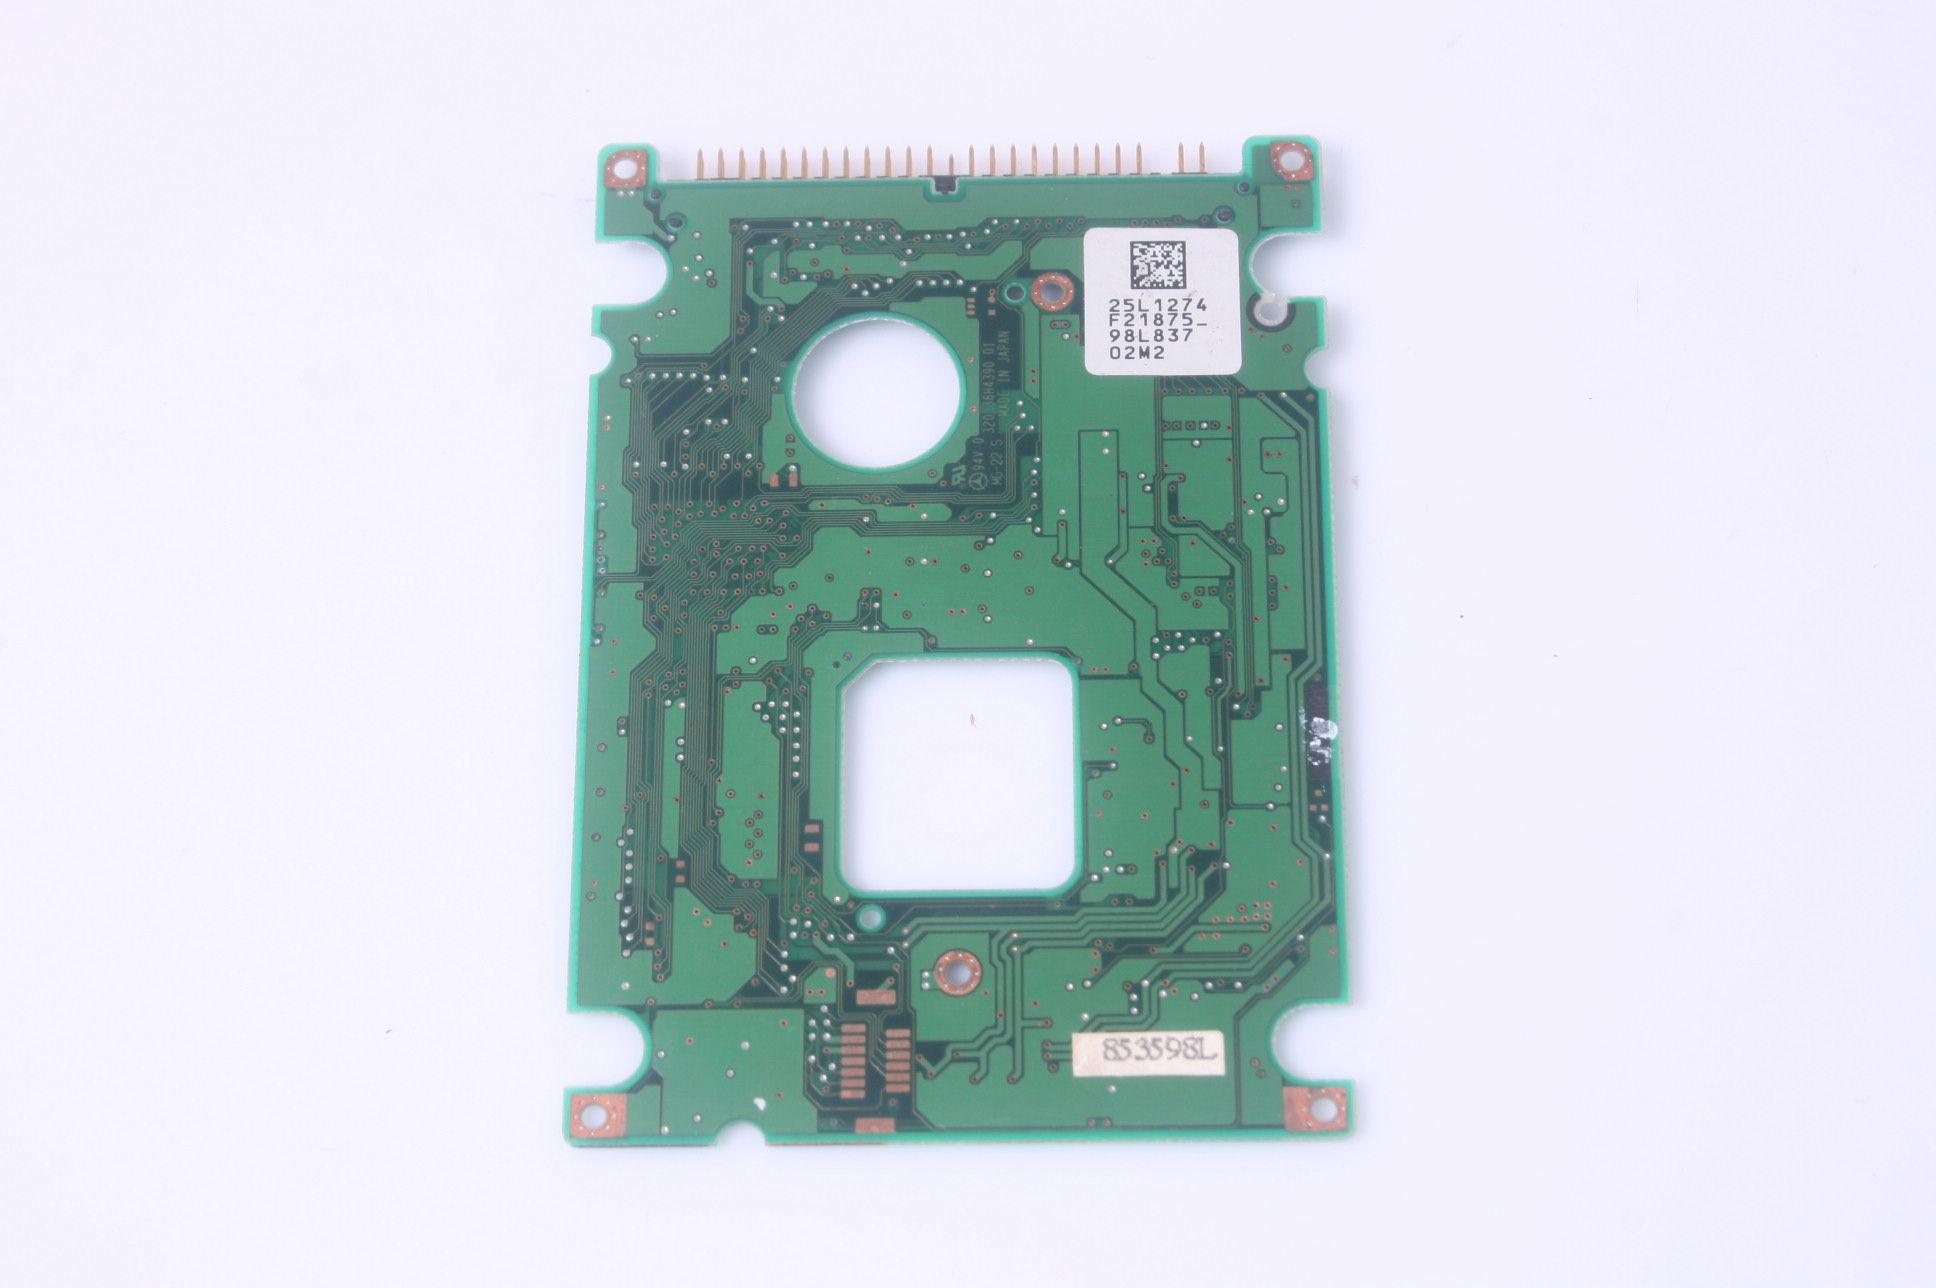 IBM DKLA-22160 2.1GB 2.5 IDE HARD DRIVE / PCB (CIRCUIT BOARD) ONLY FOR DA